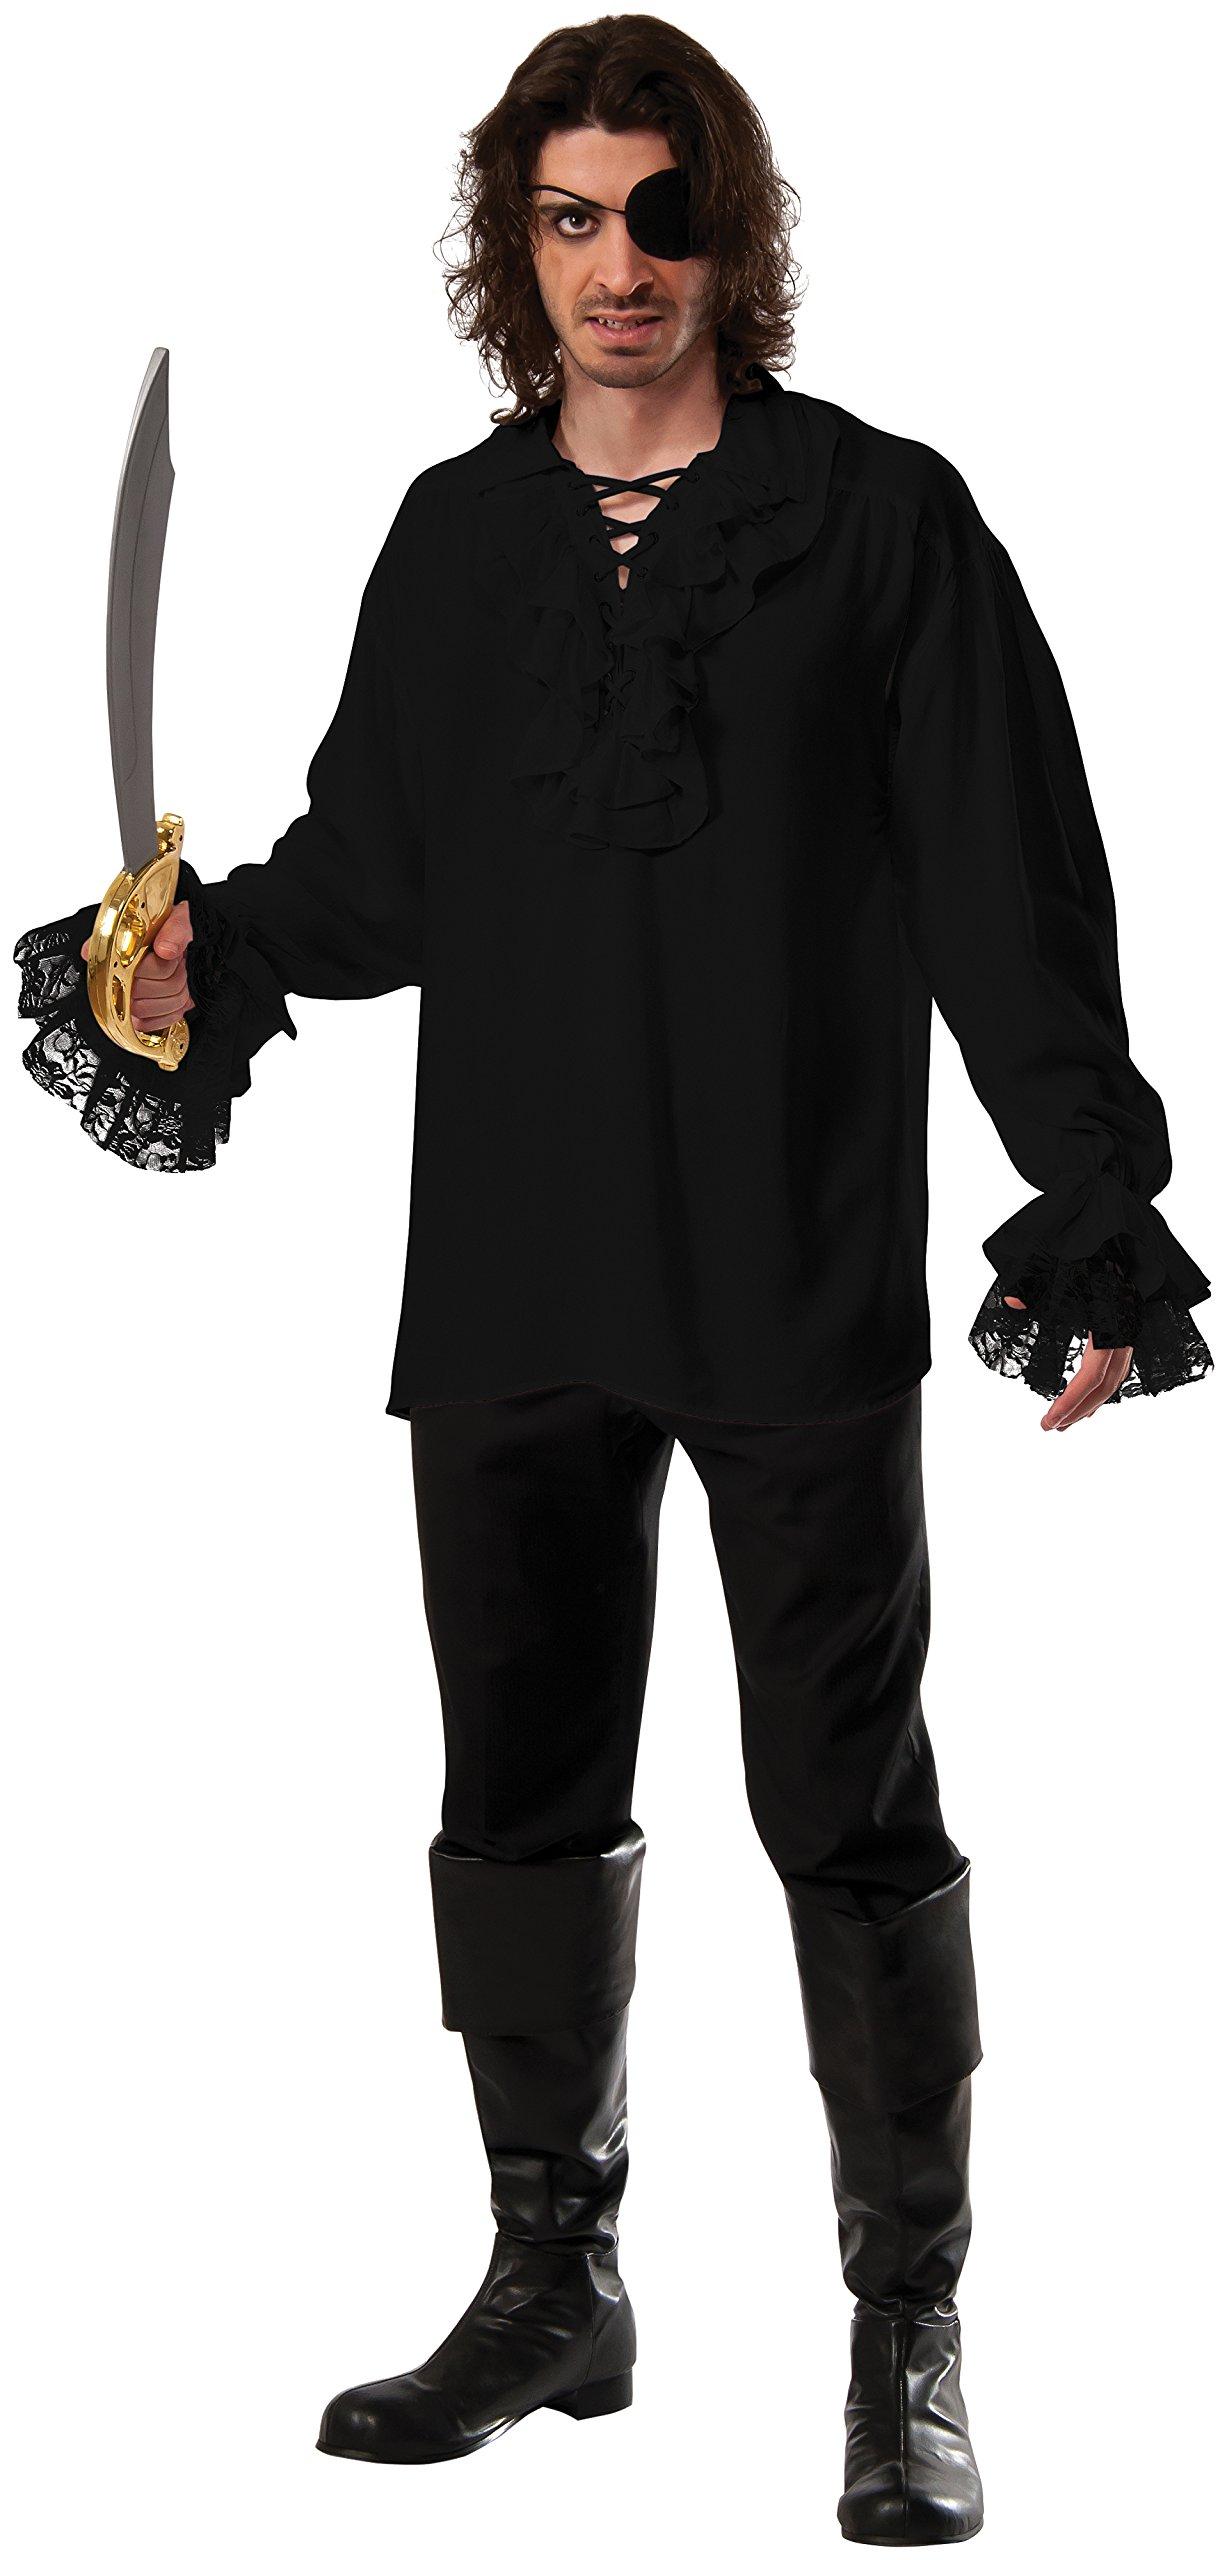 Rubie's Costume CO Men's Ruffled Cotton Dark Pirate Shirt, Black, X-Large